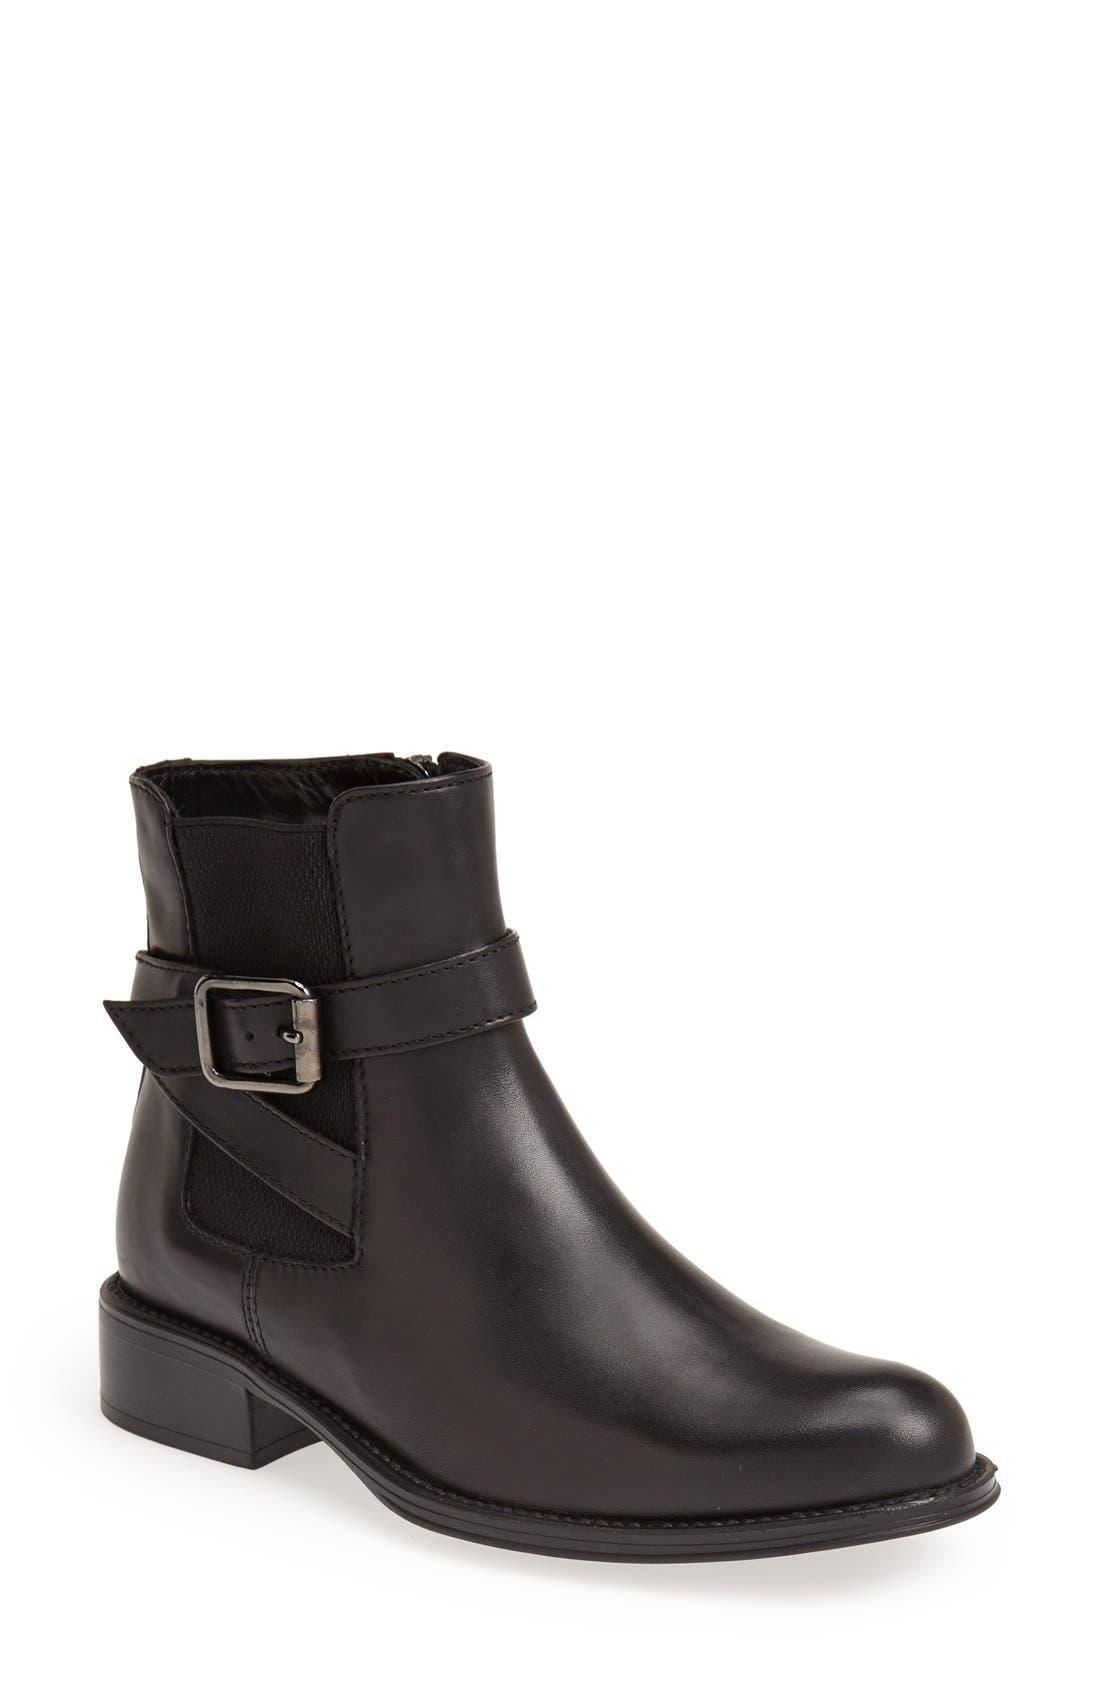 Alternate Image 1 Selected - Aquatalia 'Uriah' Weatherproof Ankle Boot (Women)